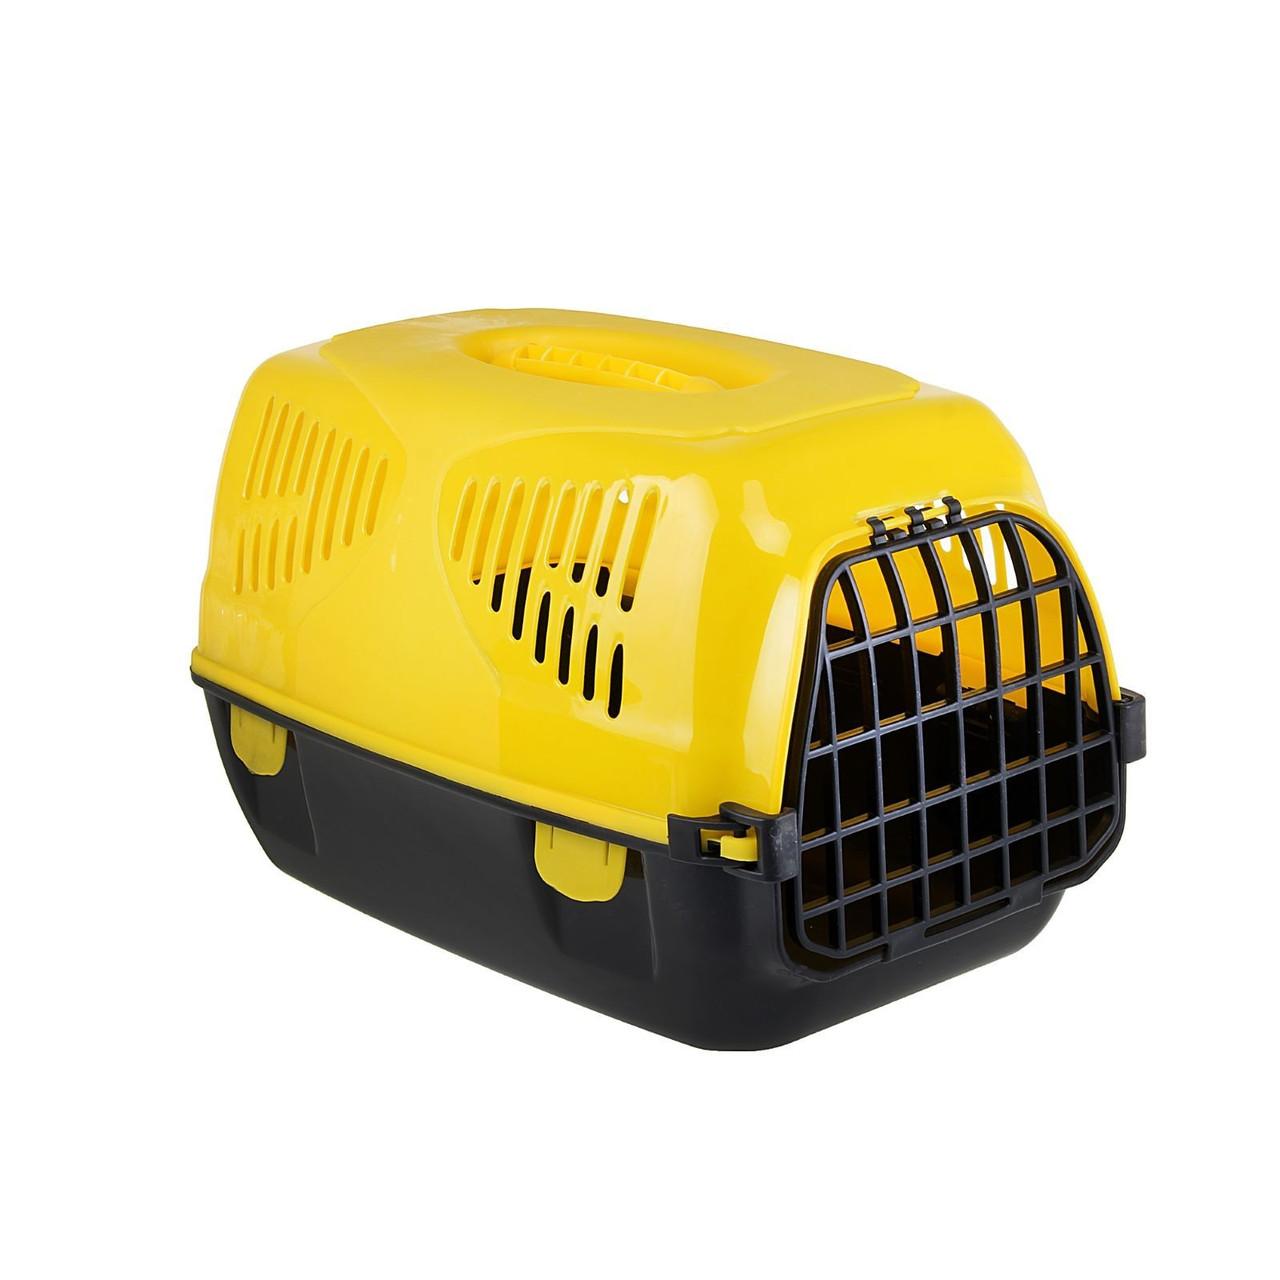 "Переноска для животных ""Сириус"" 33,5 х 31 х 50 см, цвет желтый"